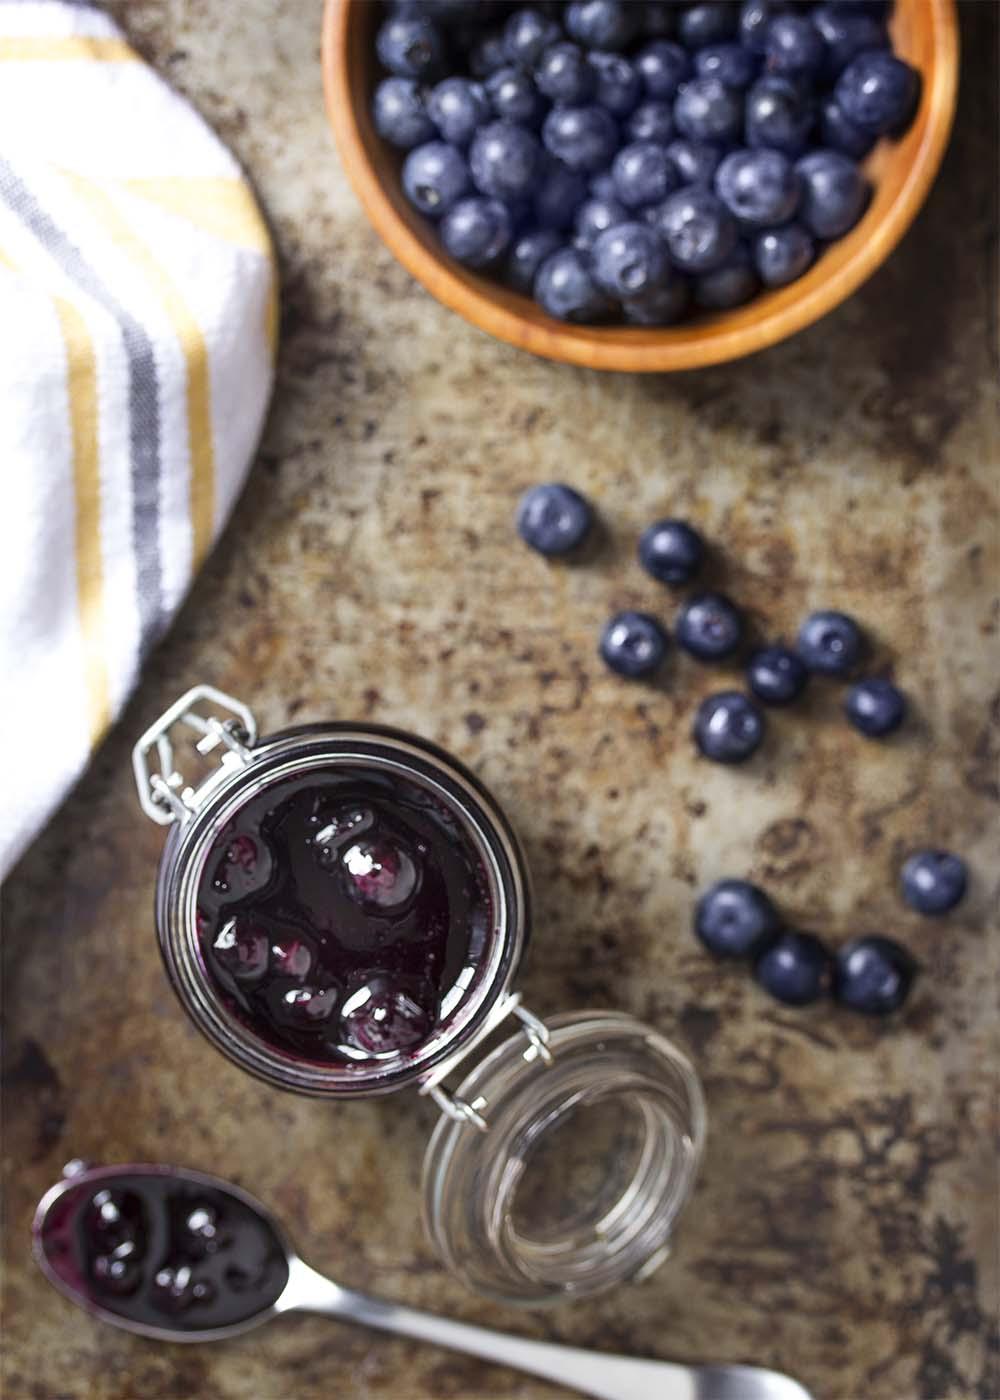 Homemade blueberry sauce in a mason jar.